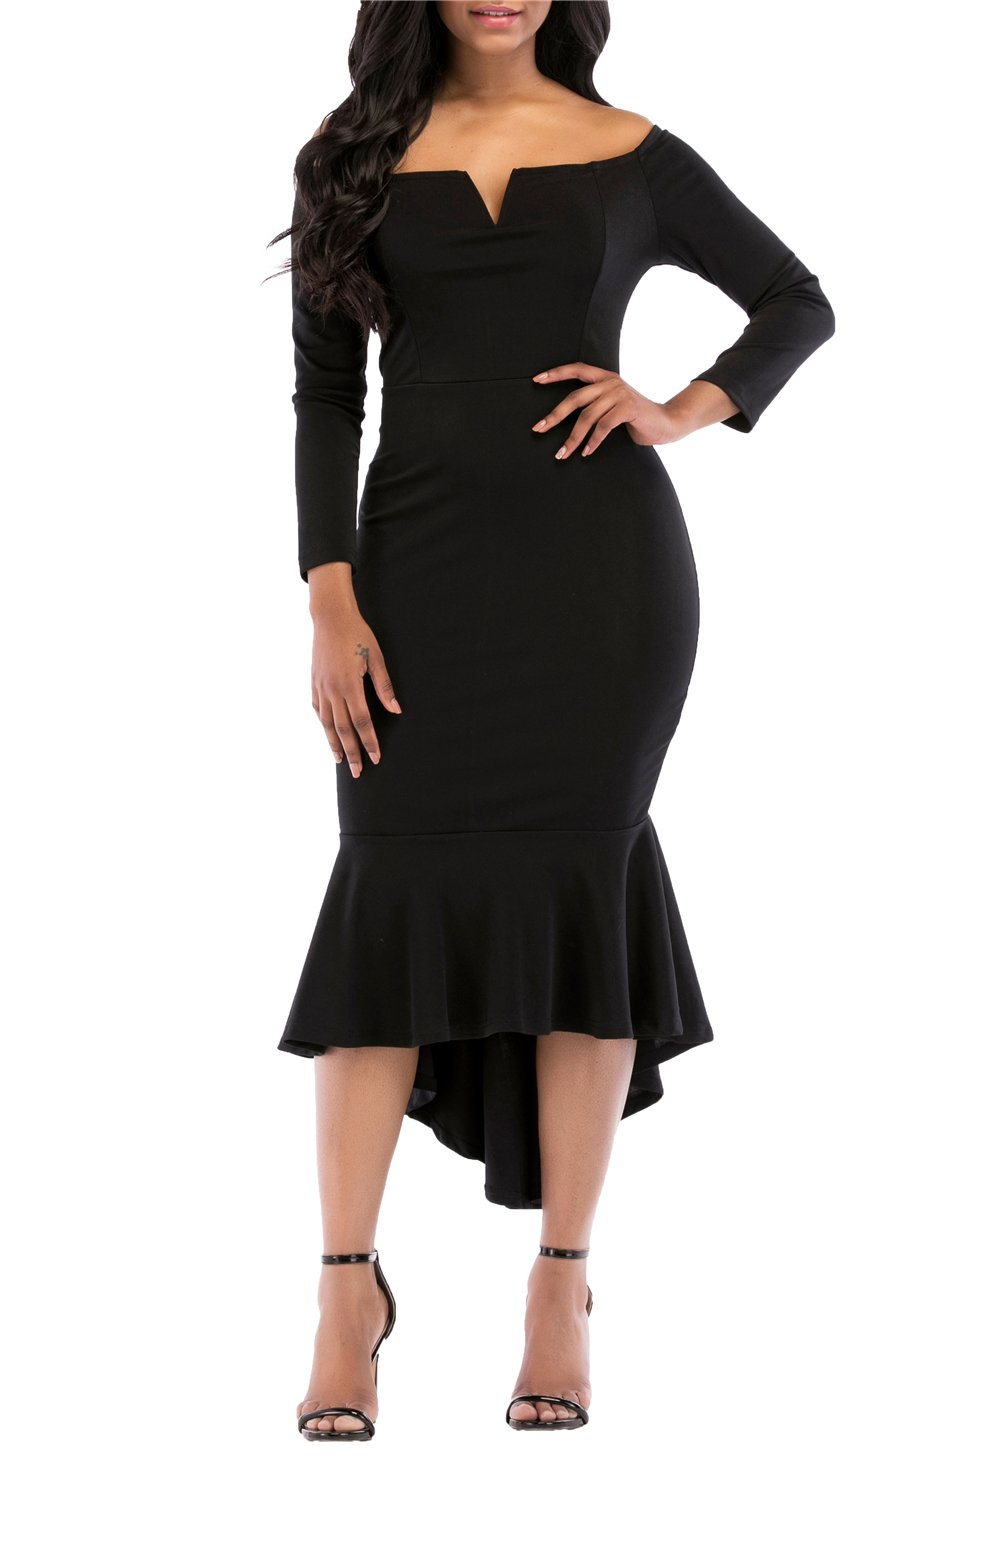 ONLYSHE Women's Swallowtail Skirt Wear To Work Prom Dress Pencil Dress Long Sleeves Black XX-Large